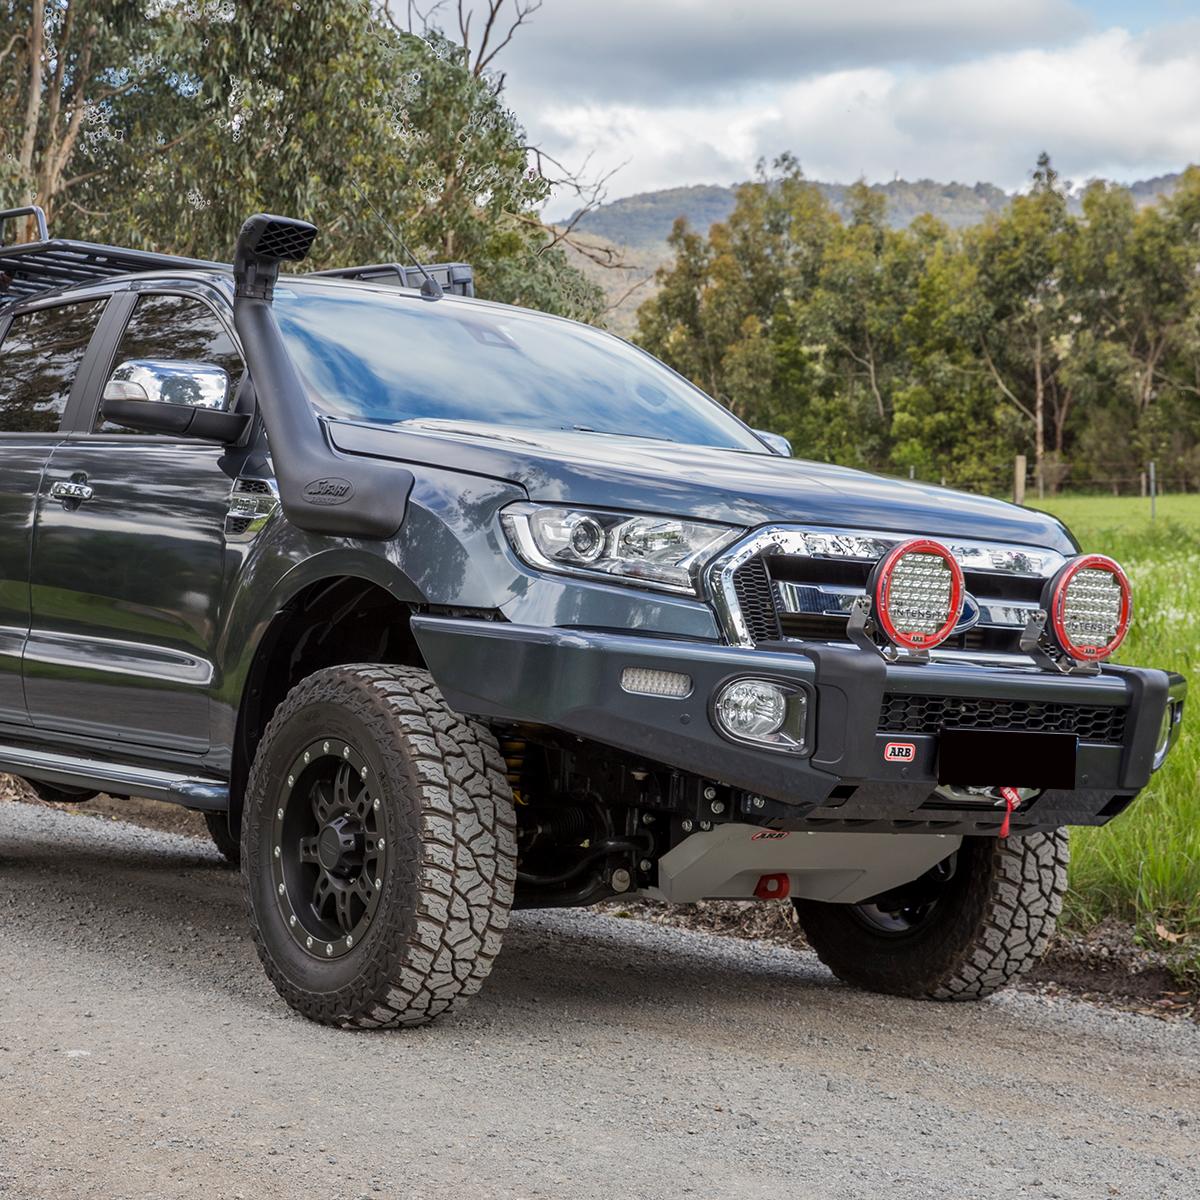 Arb Ranger Mkiii Under Vehicle Life Style Store